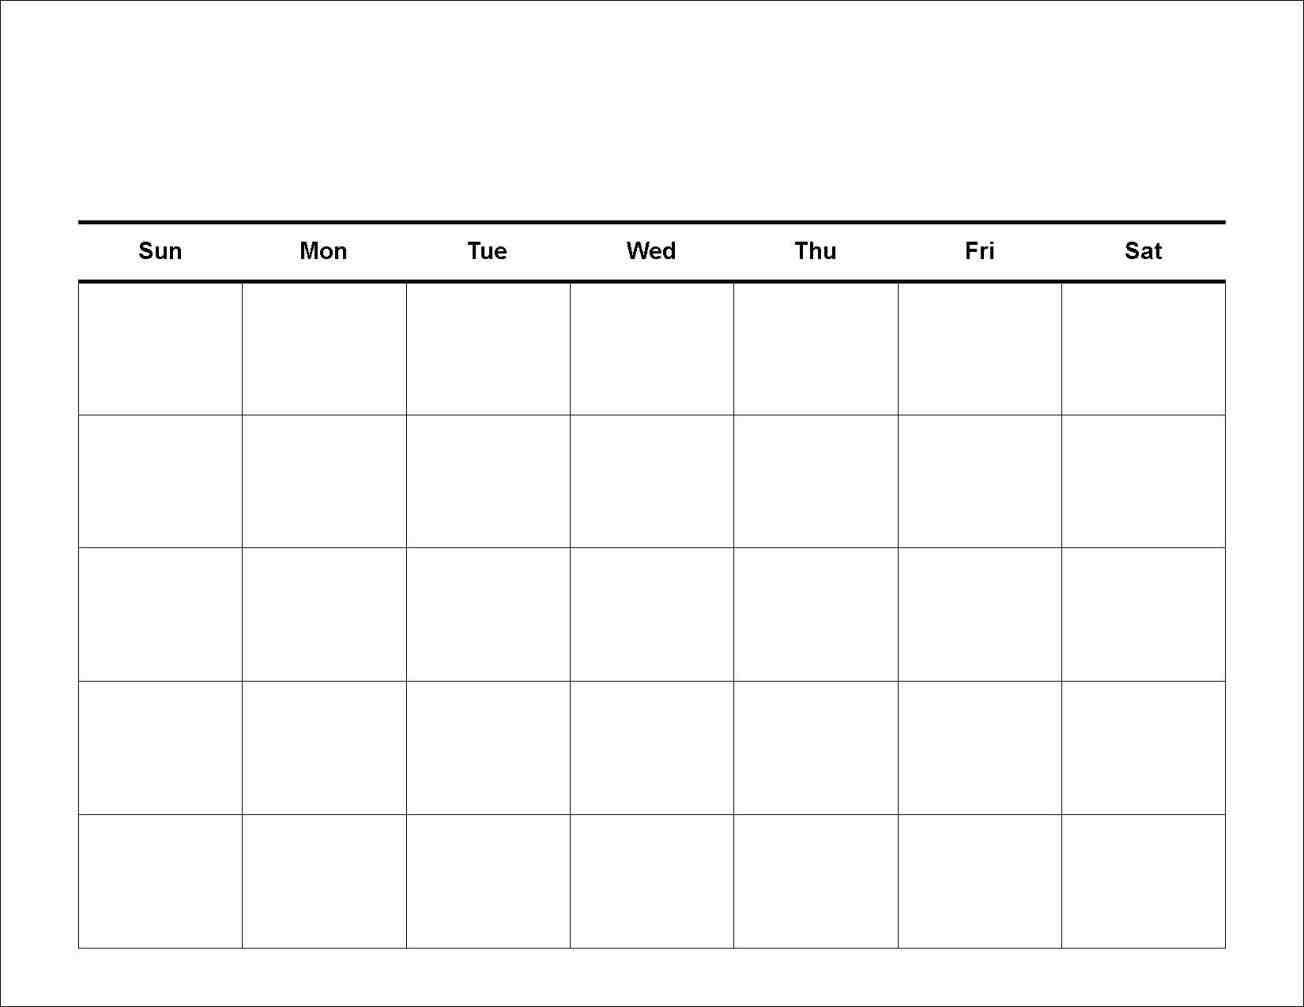 7 Day Calendar Template | Free Printable Calendar Templates within Free Priintable Calendar Day By Day